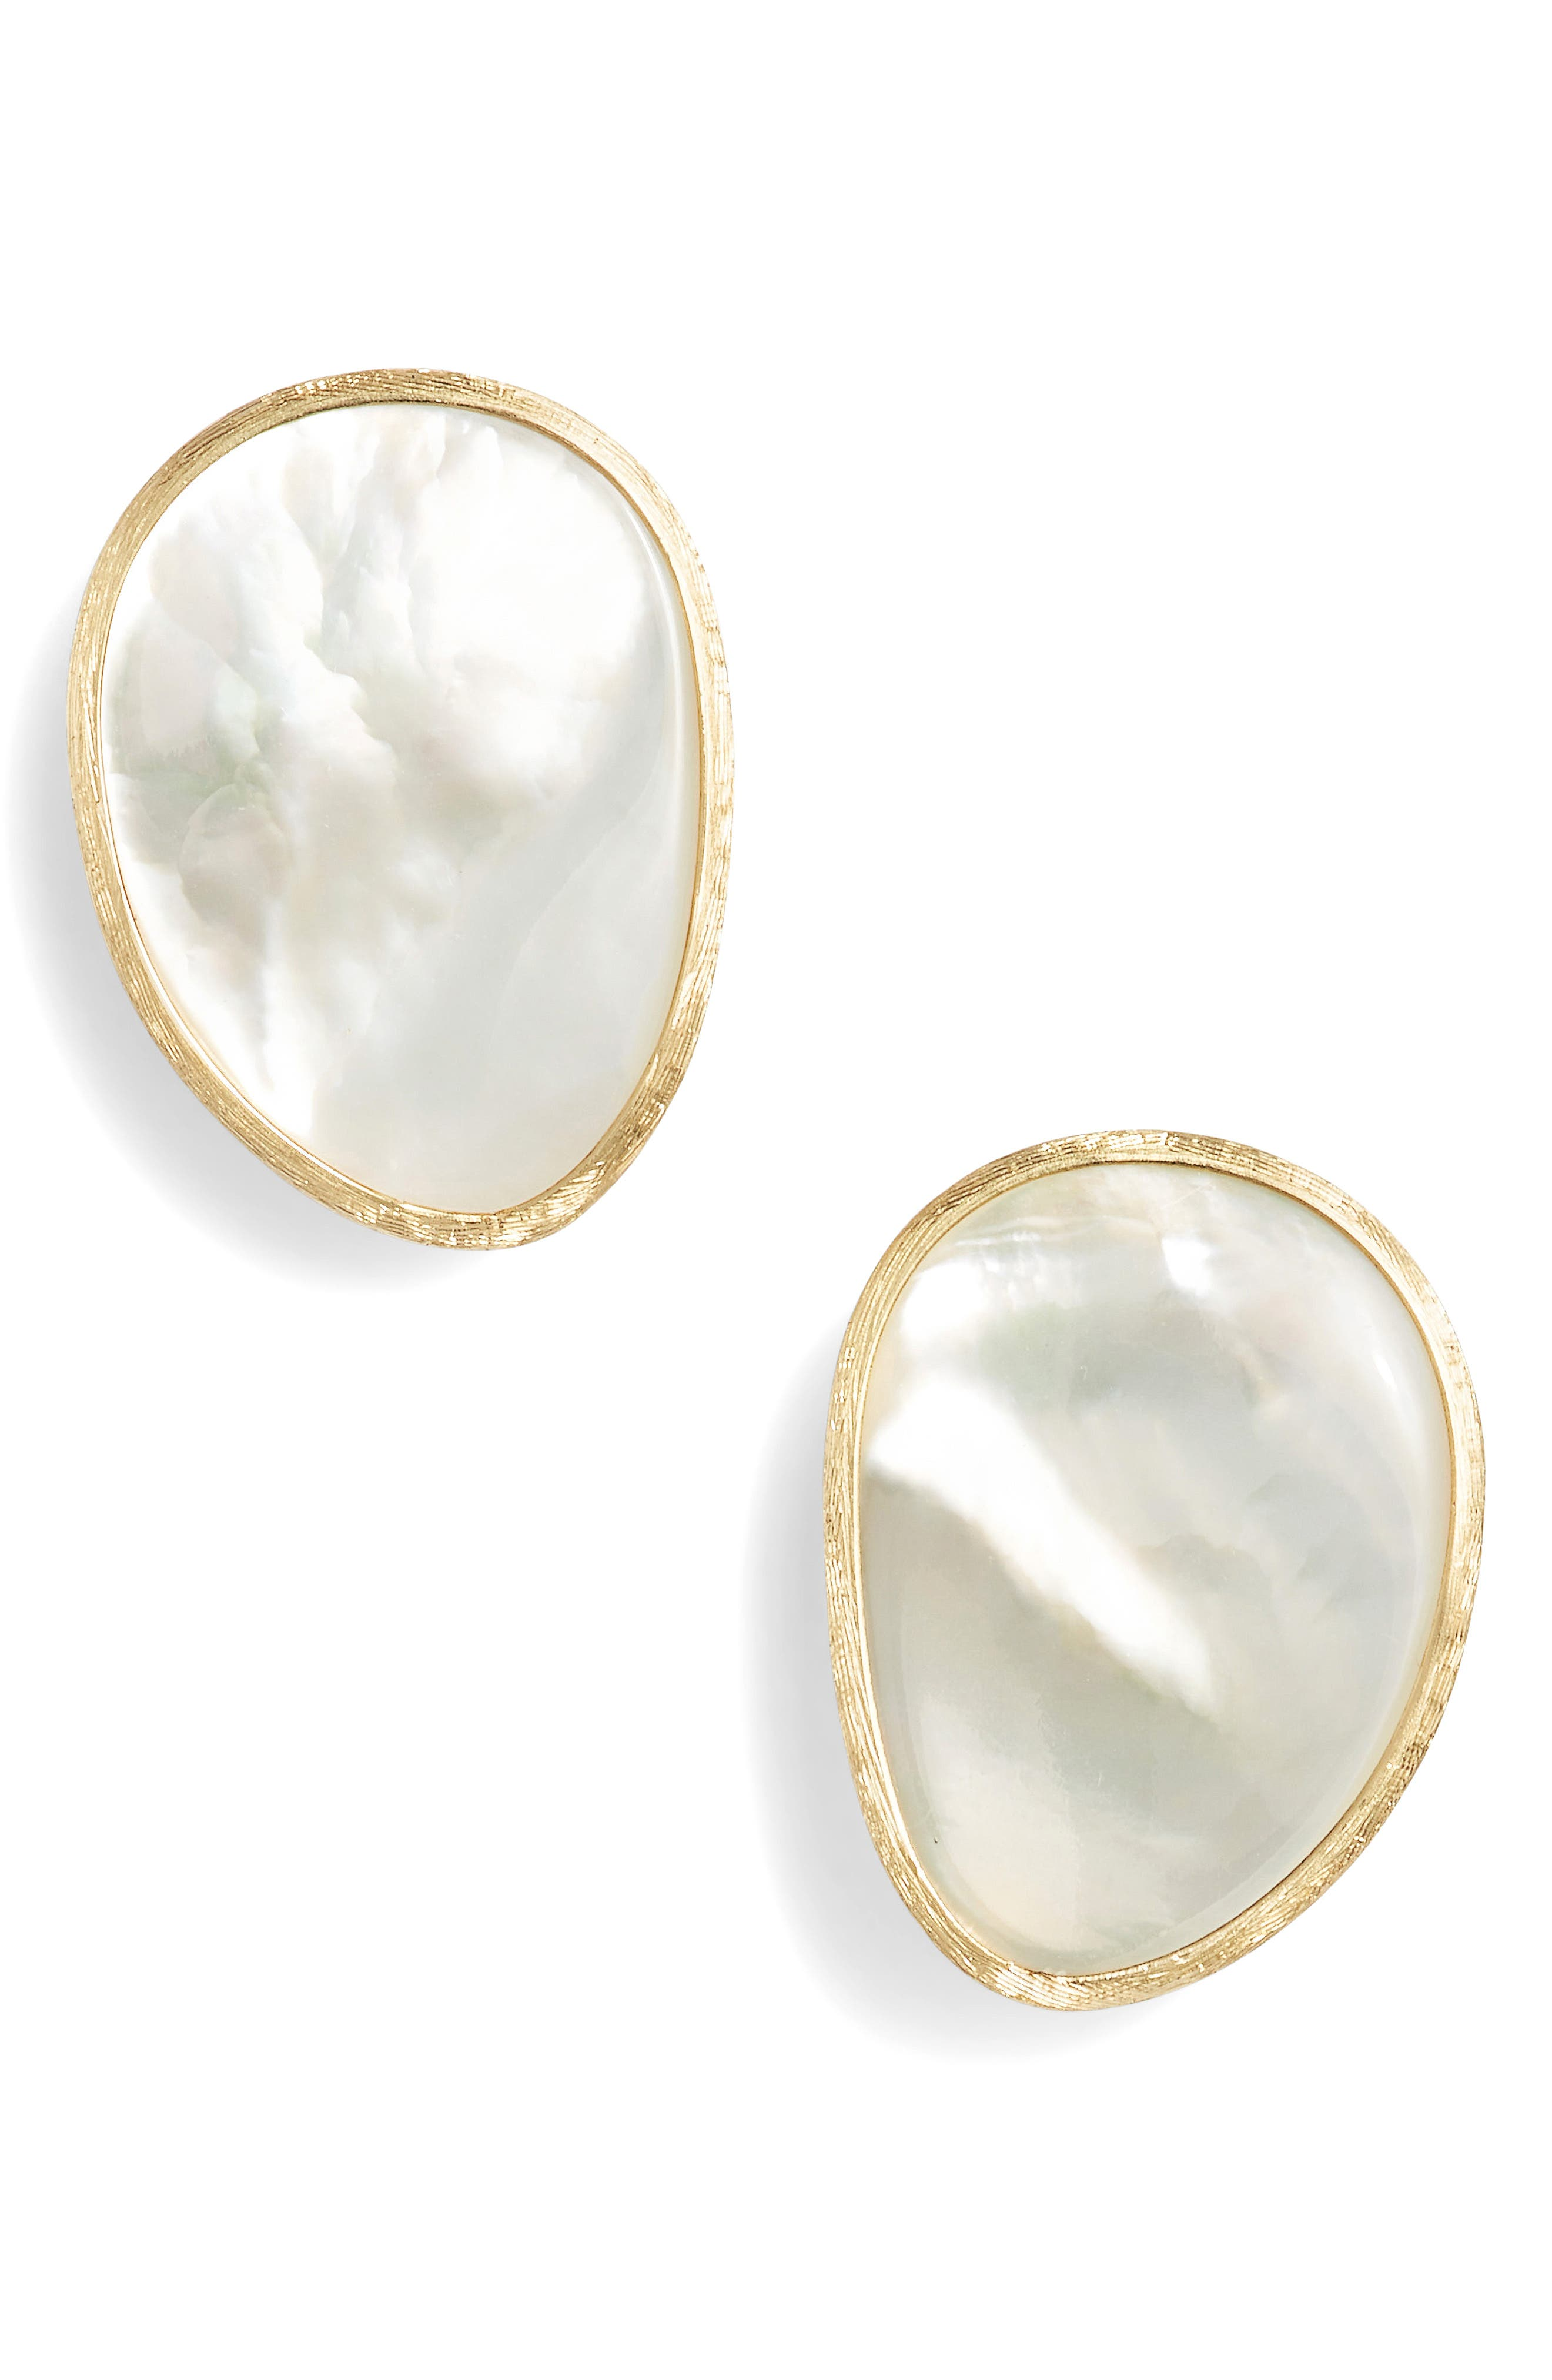 Marco Bicego Lunaria Pearl Stud Earrings